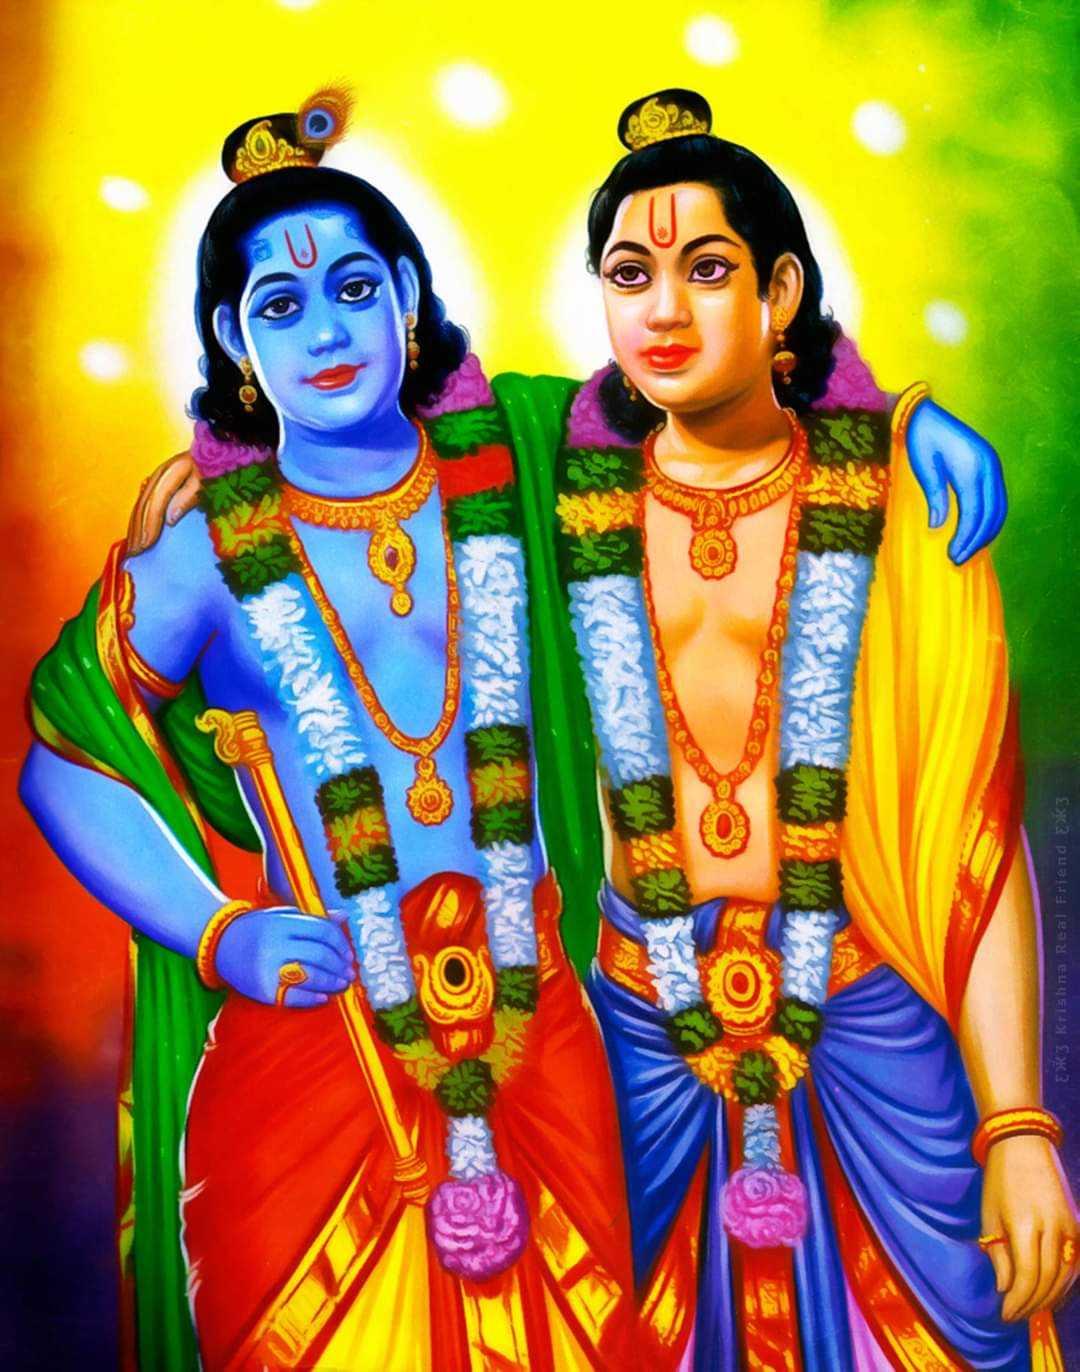 Krishna wallpaper Balram krishna wallpaper - Krishna wallpaper Balram krishna wallpaper